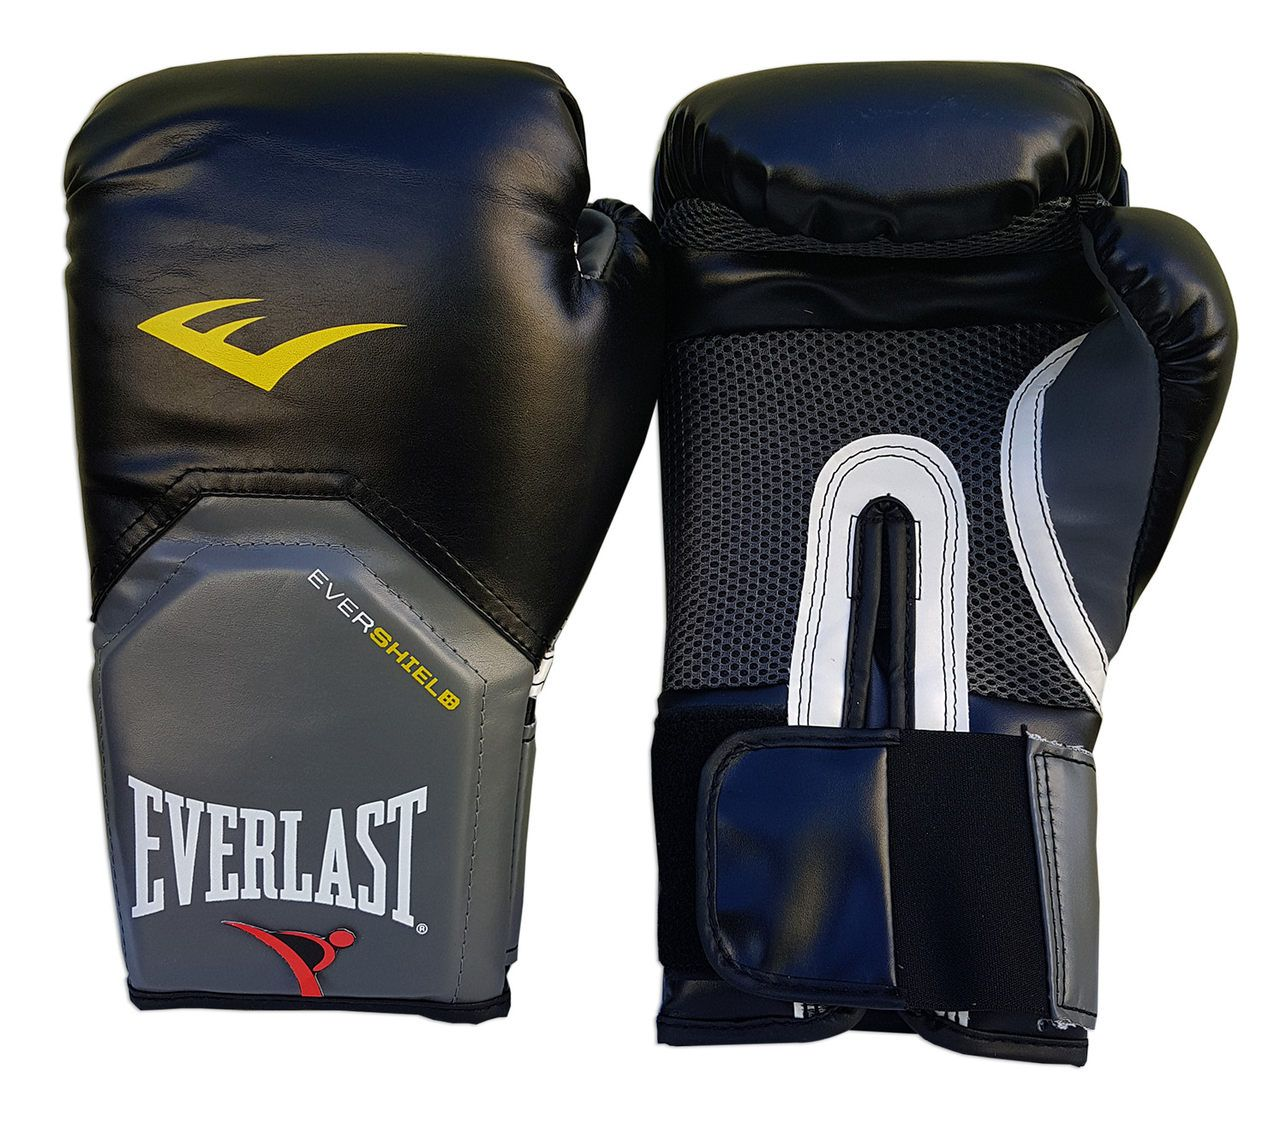 Luva de Boxe / Muay Thai 14oz - Preto - Pro Style - Everlast  - PRALUTA SHOP